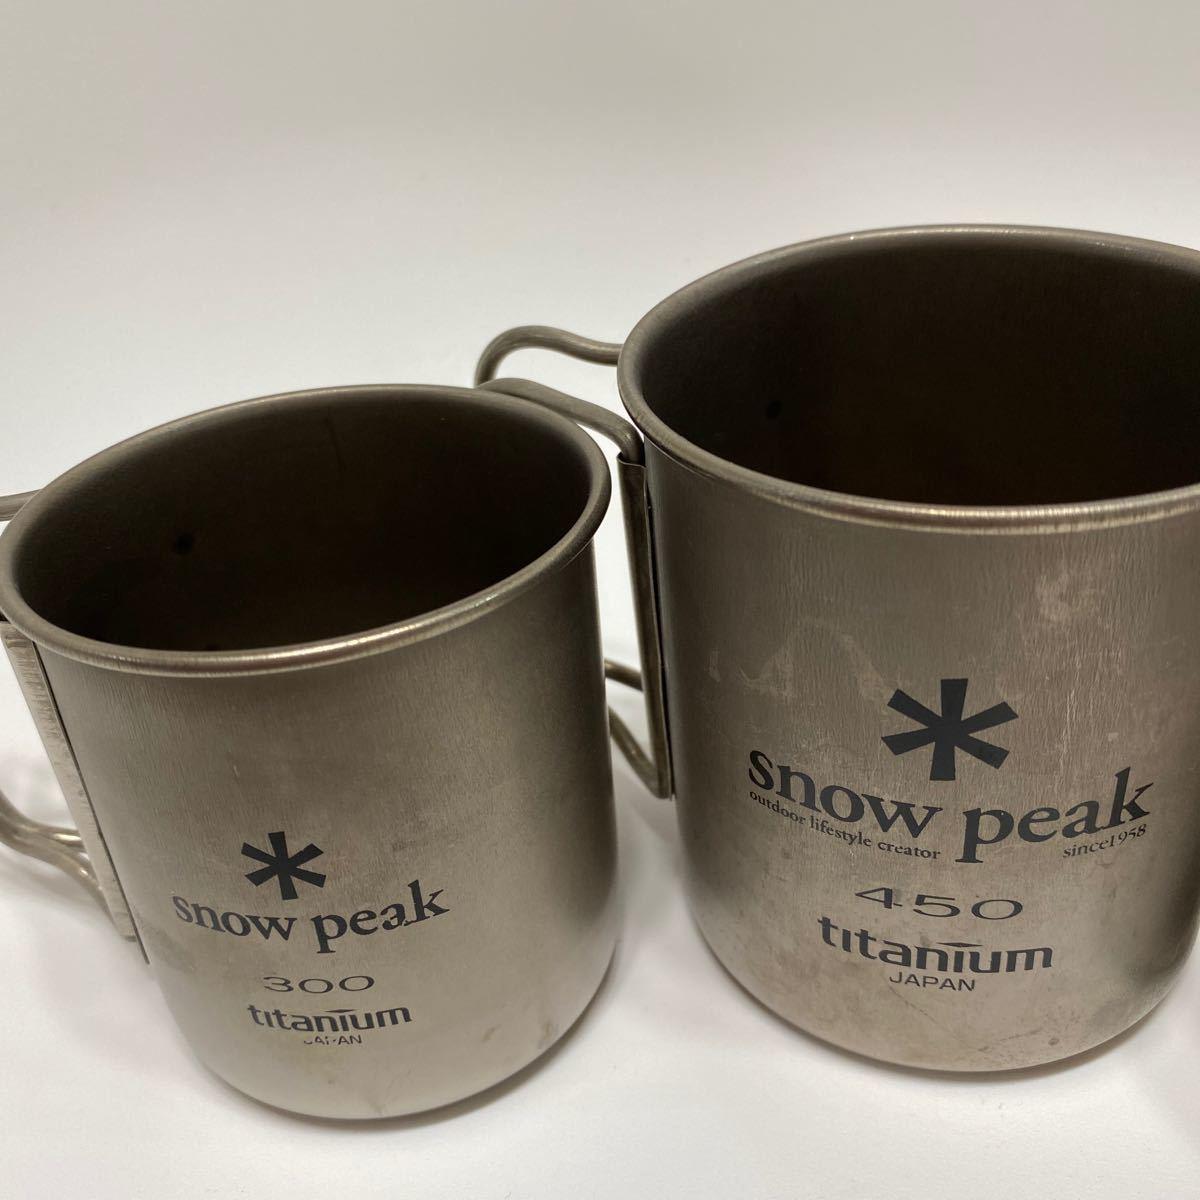 snow peak スノーピーク チタン ダブルマグ シングルマグ 3点セット 新品未使用含む